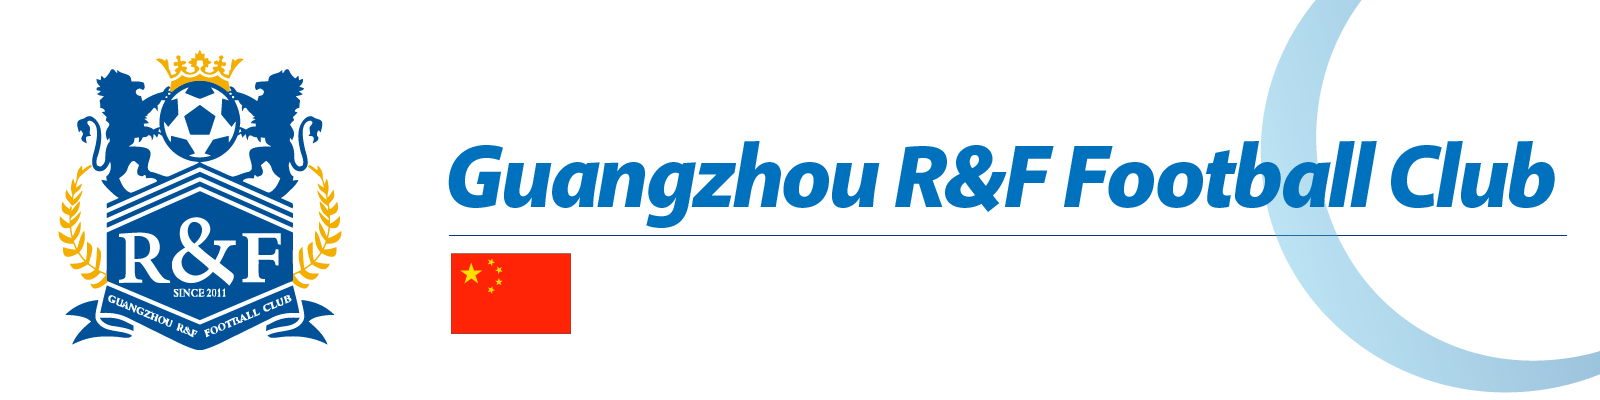 U 12 Junior Soccer World Challenge 2017 Guangzhou R F Football Club